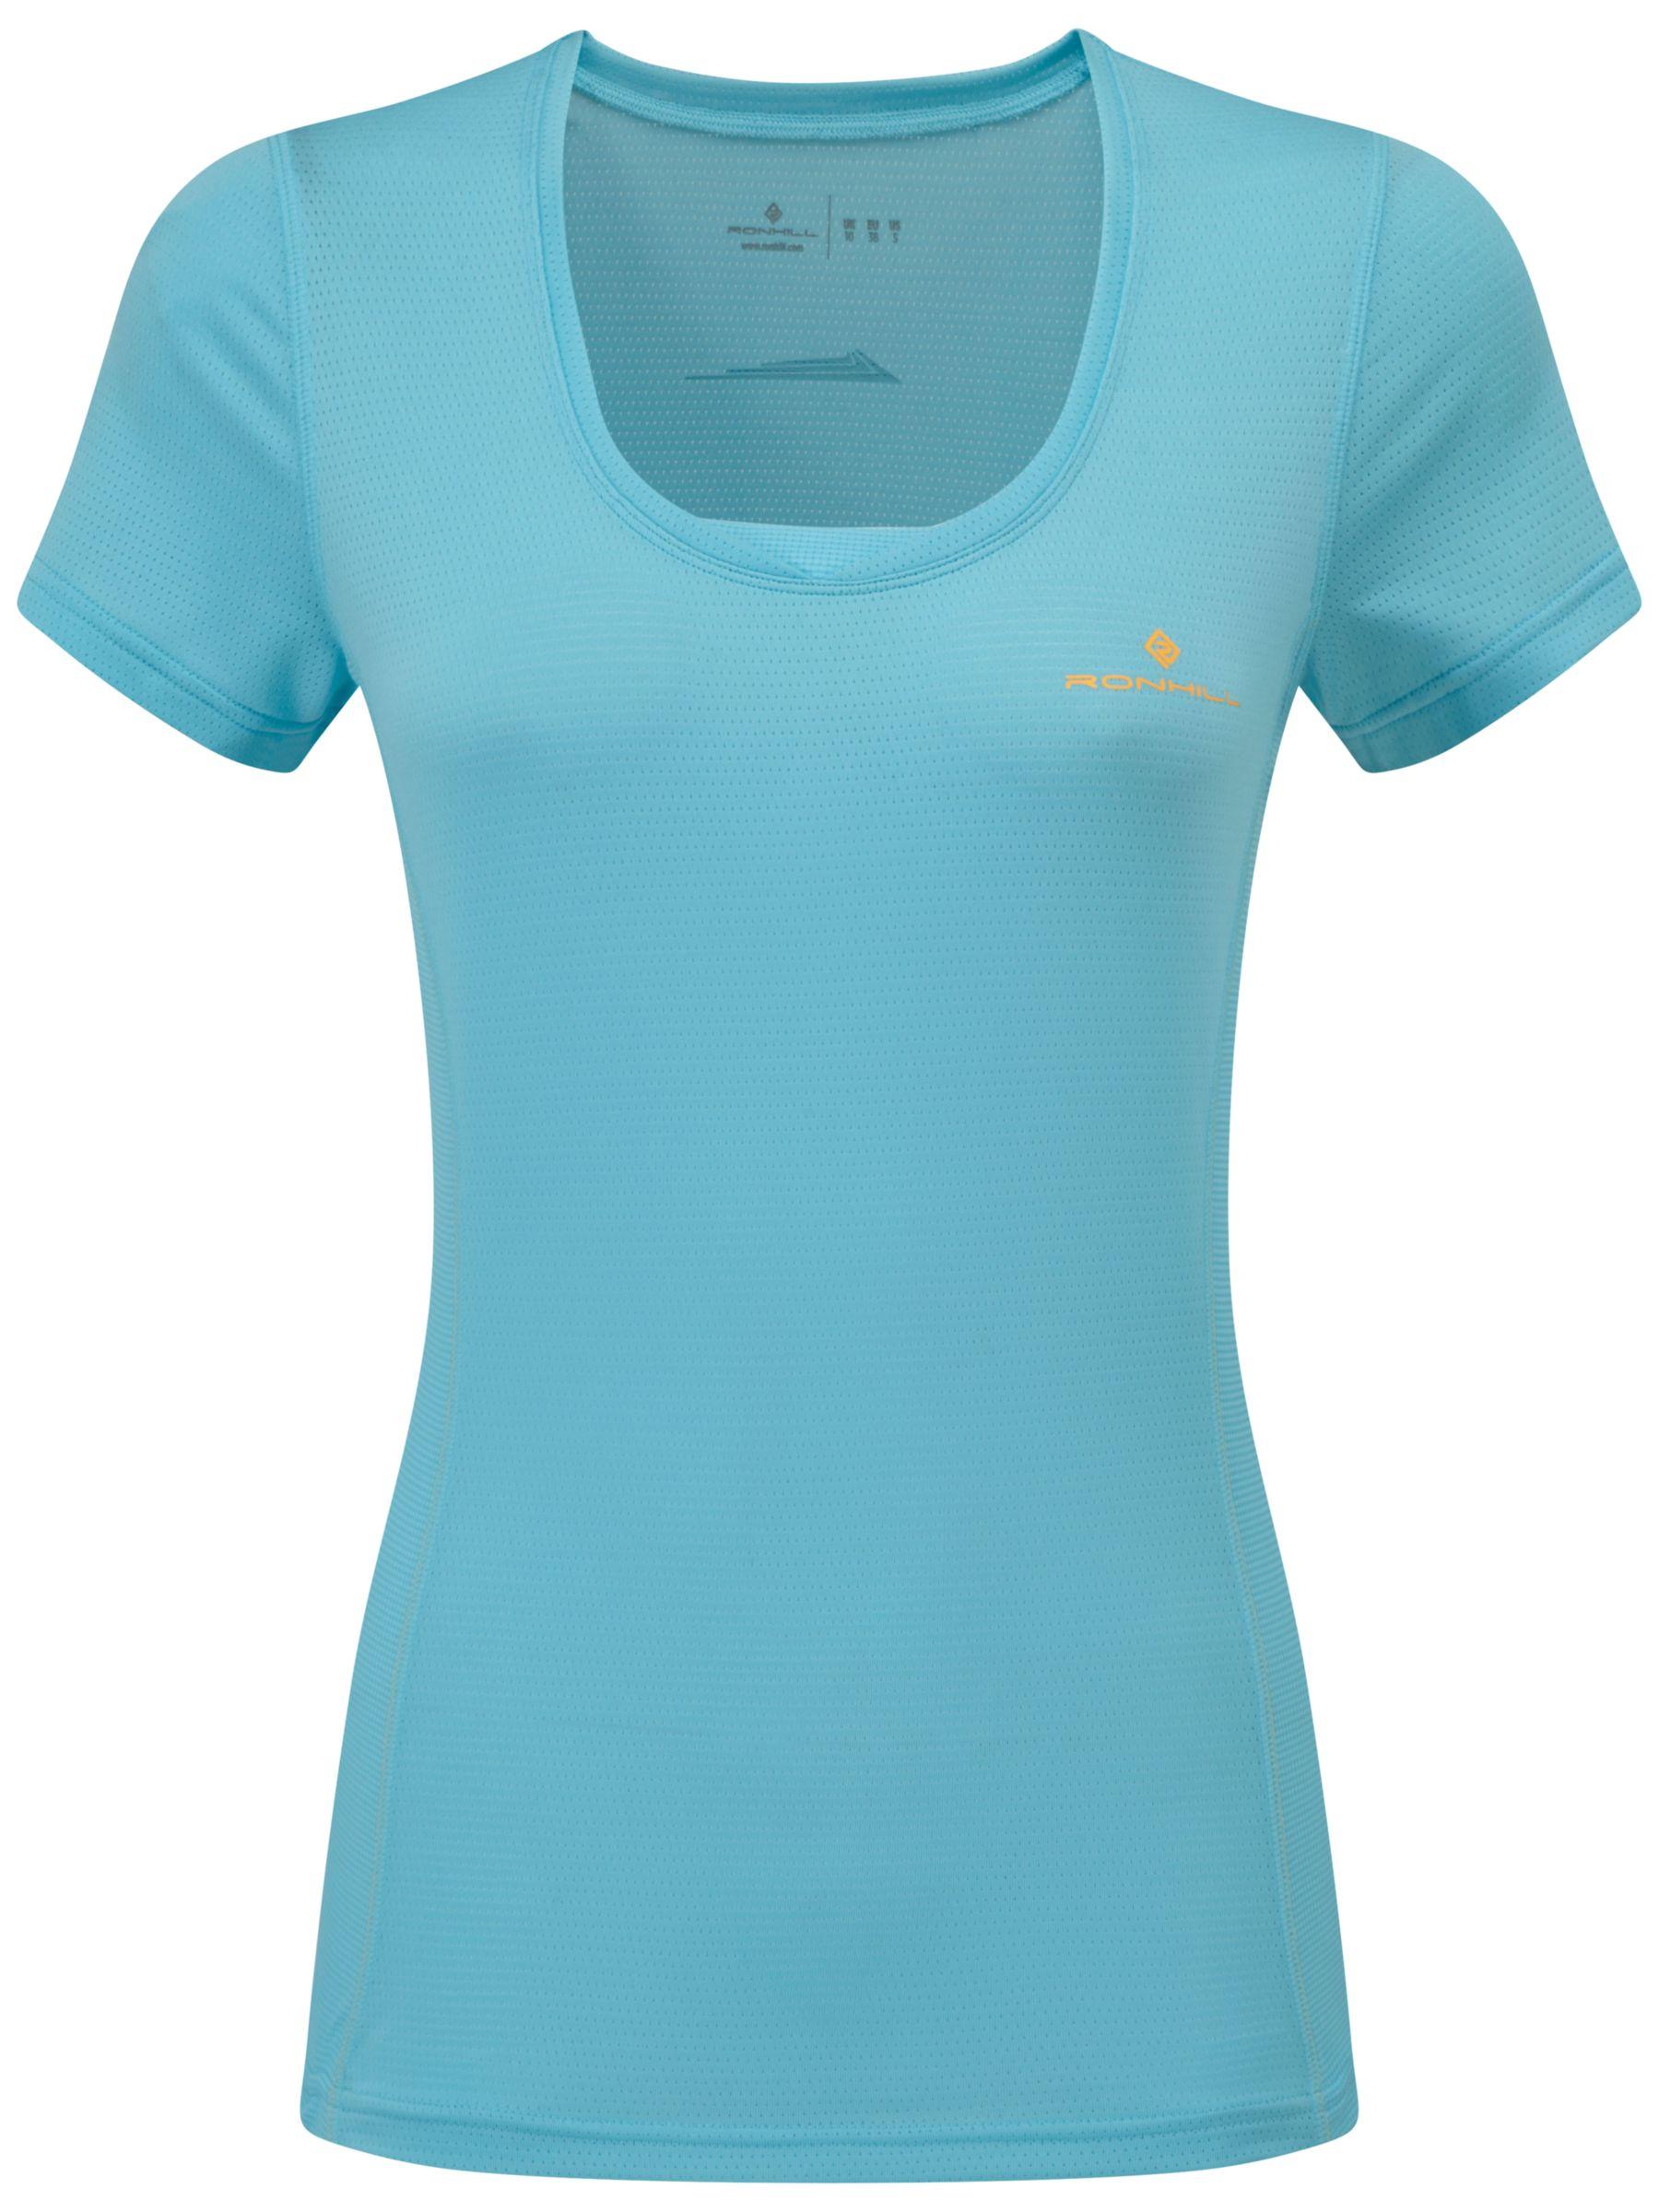 Ronhill Ronhill Stride Zeal Short Sleeve Running Top, Blue